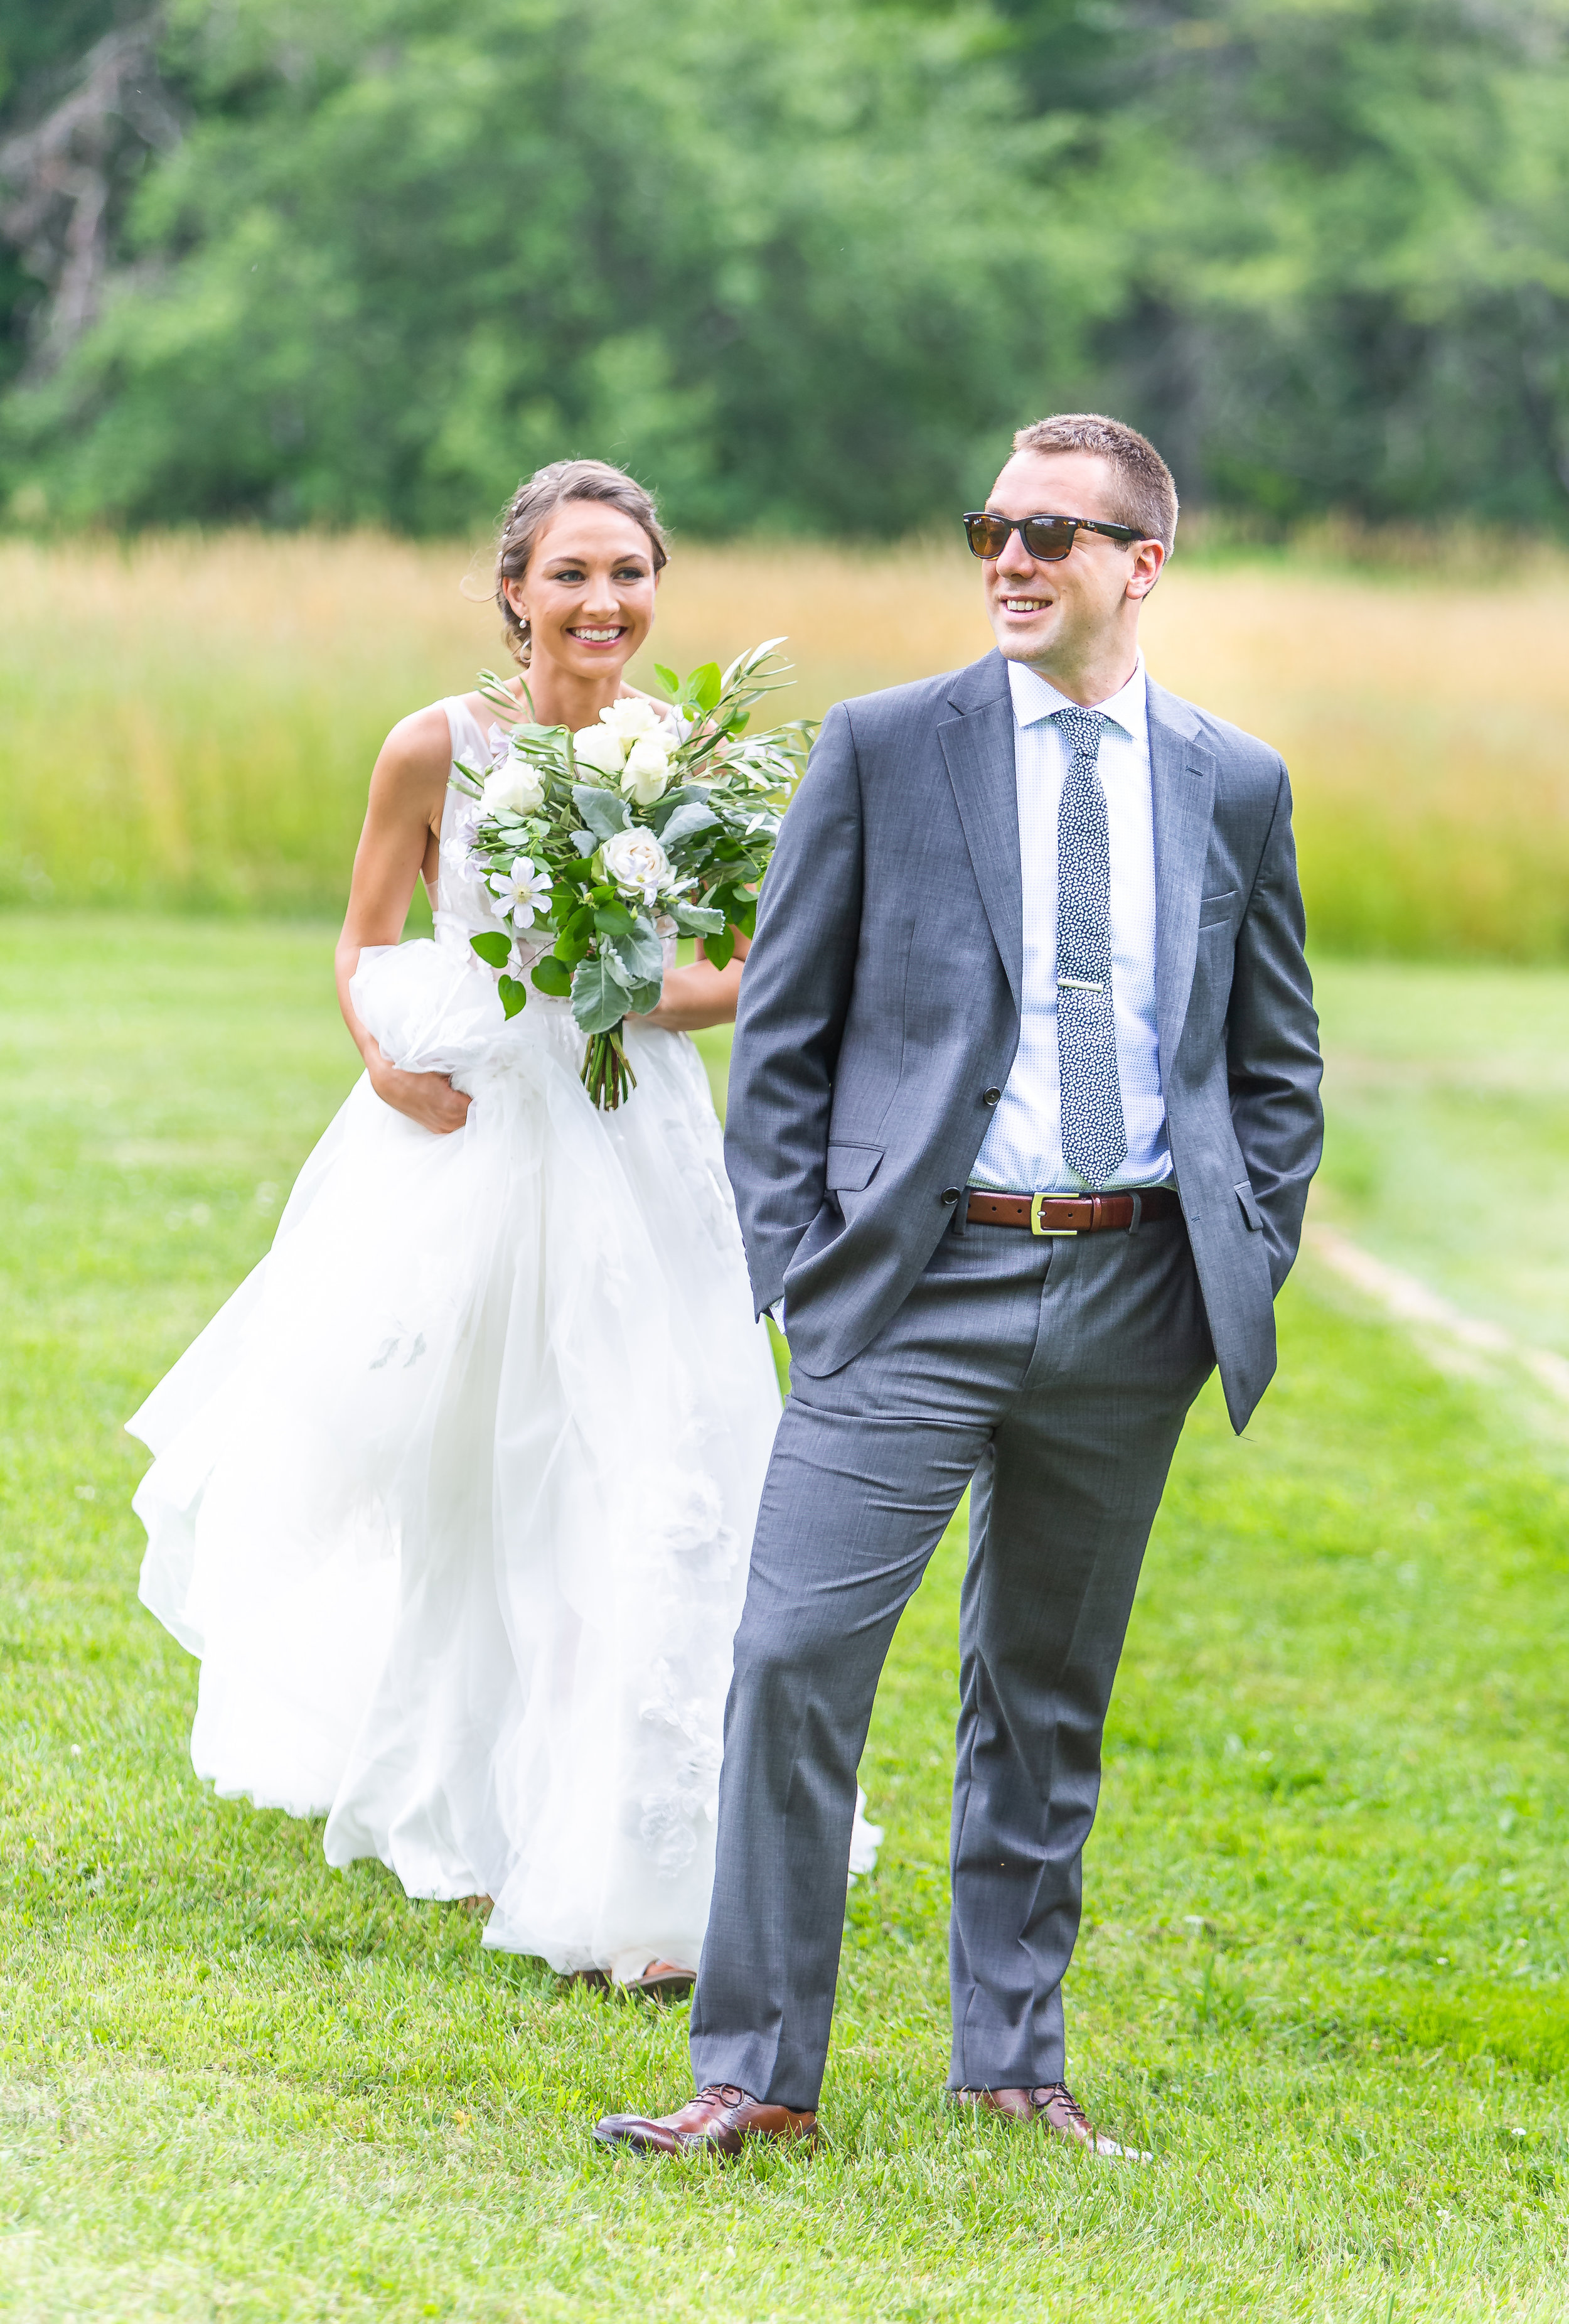 Summer Wedding at Gedney Farm in New Marlborough, MA, Sophia House and Kellen Muldoon are married on July 6th, 2019.